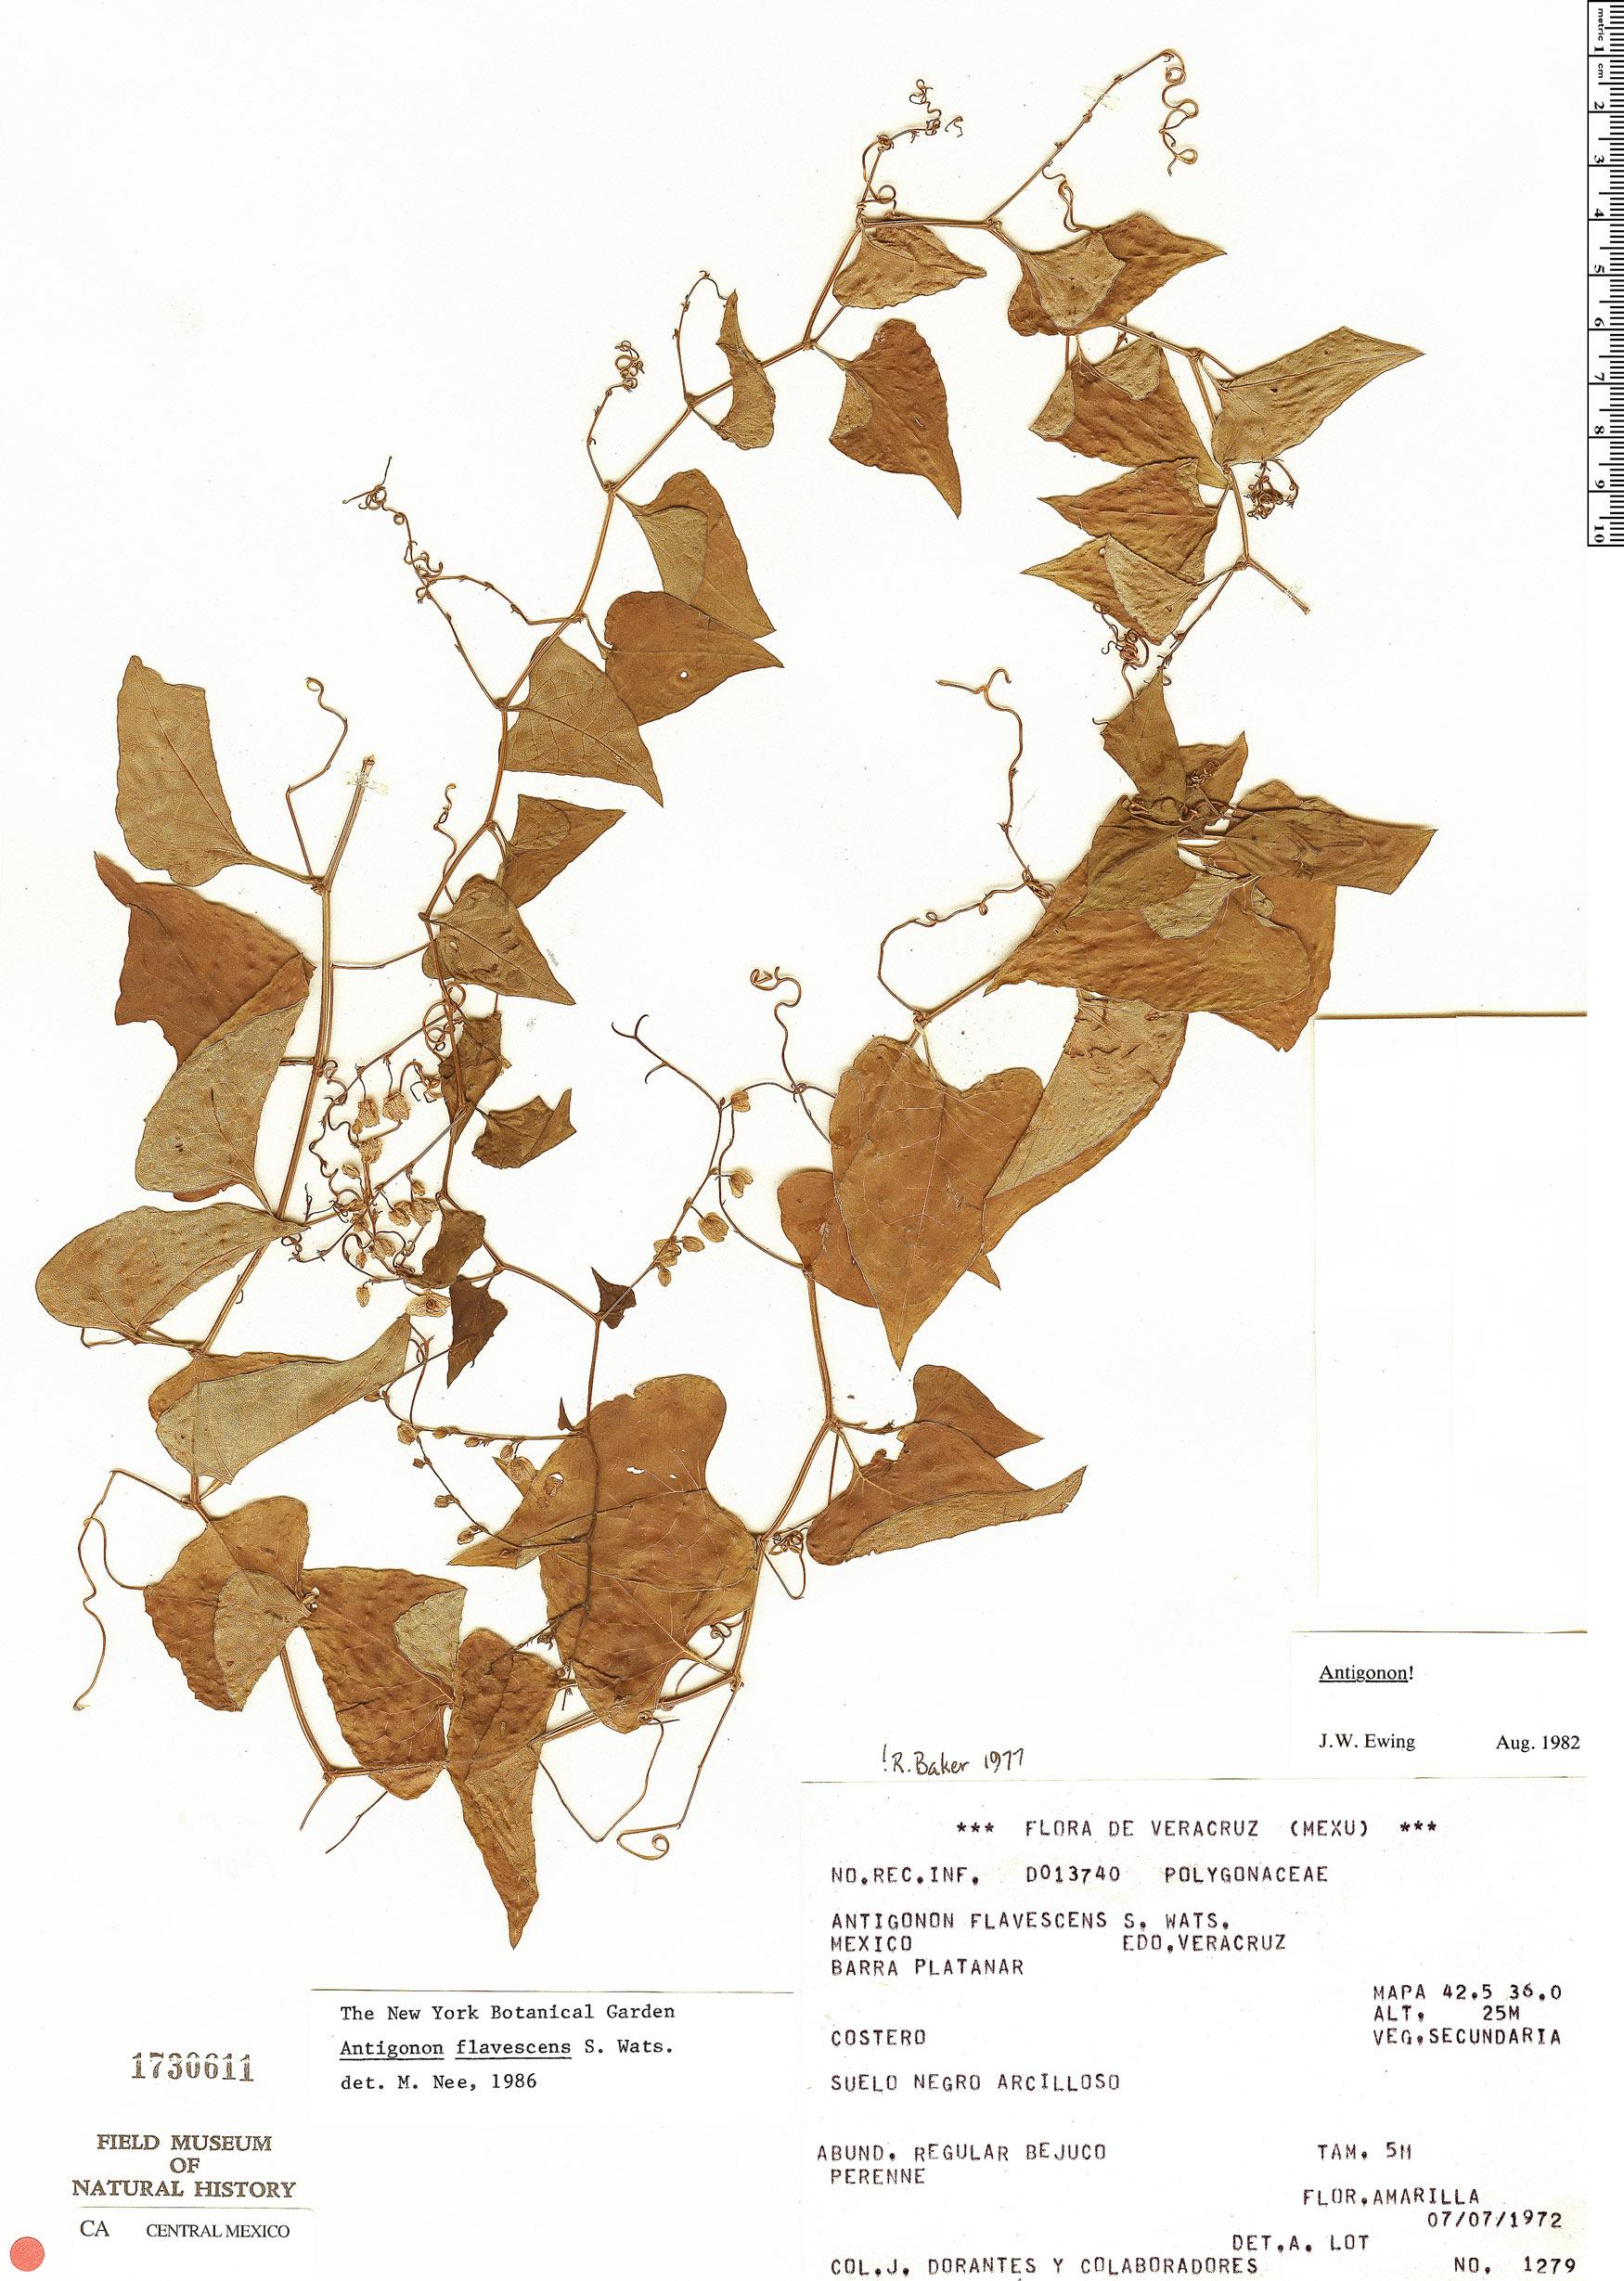 Specimen: Antigonon flavescens